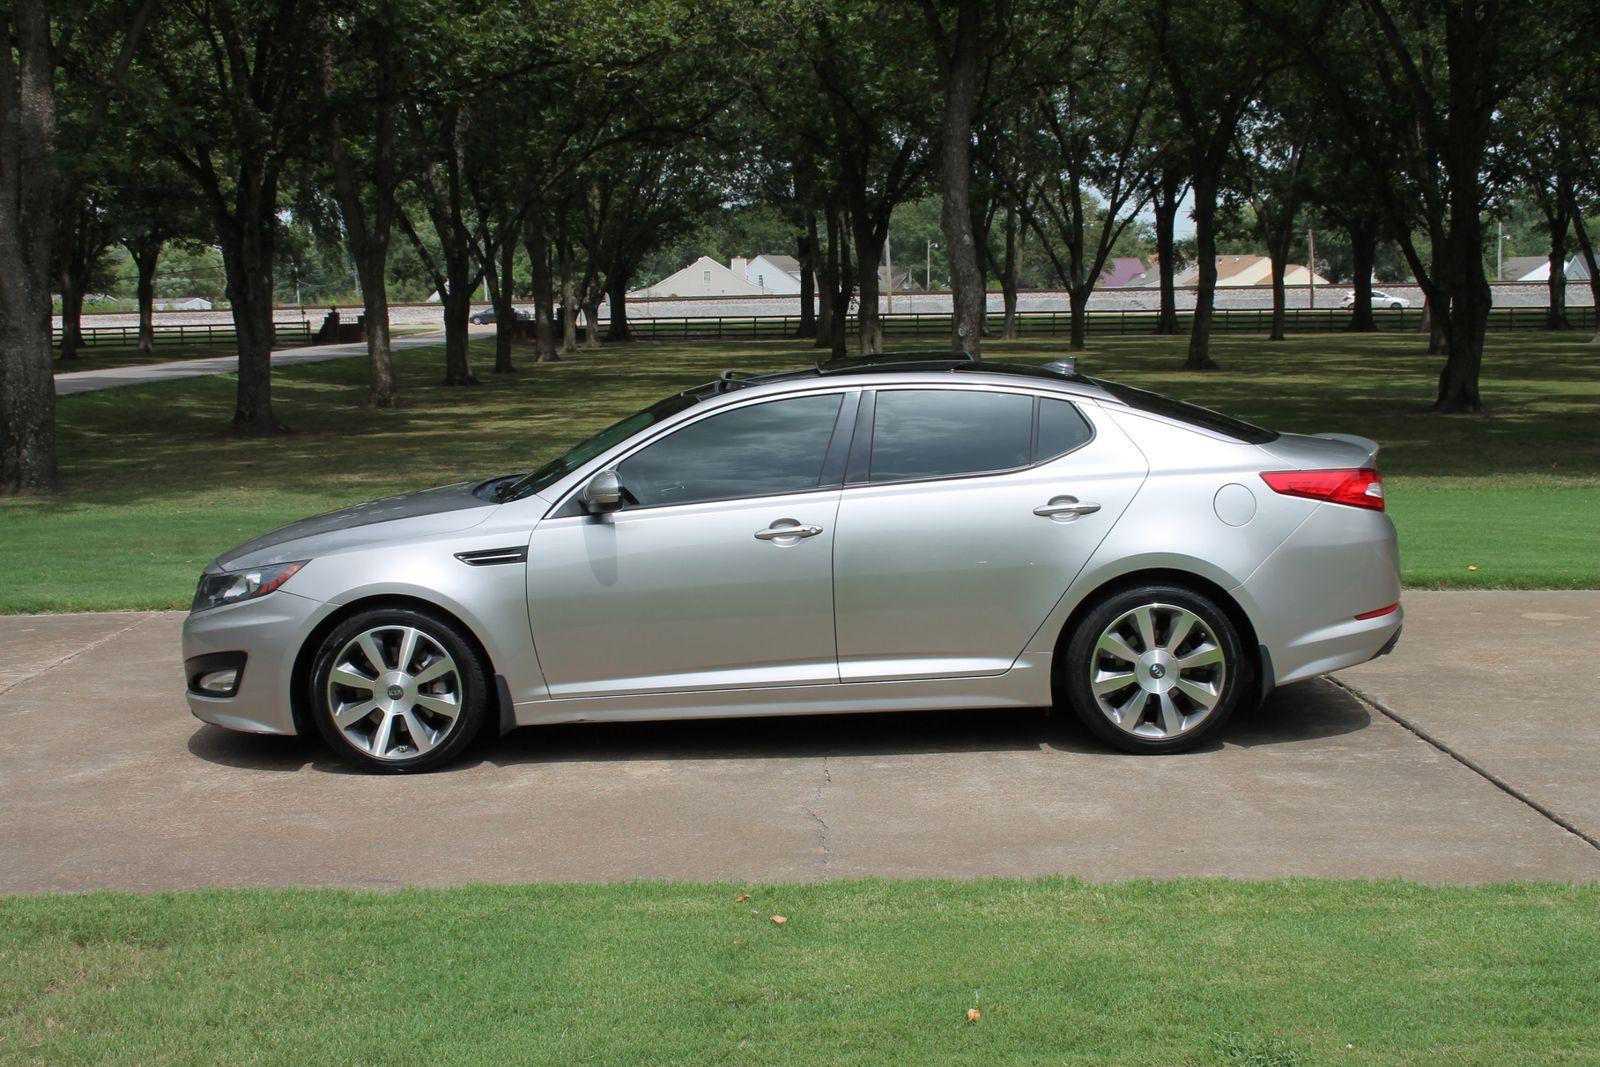 2013 Kia Optima Sx Tgdi Wlimited Pkg Price Used Cars Memphis Rear Spoiler Hallum Motors Citystatezip